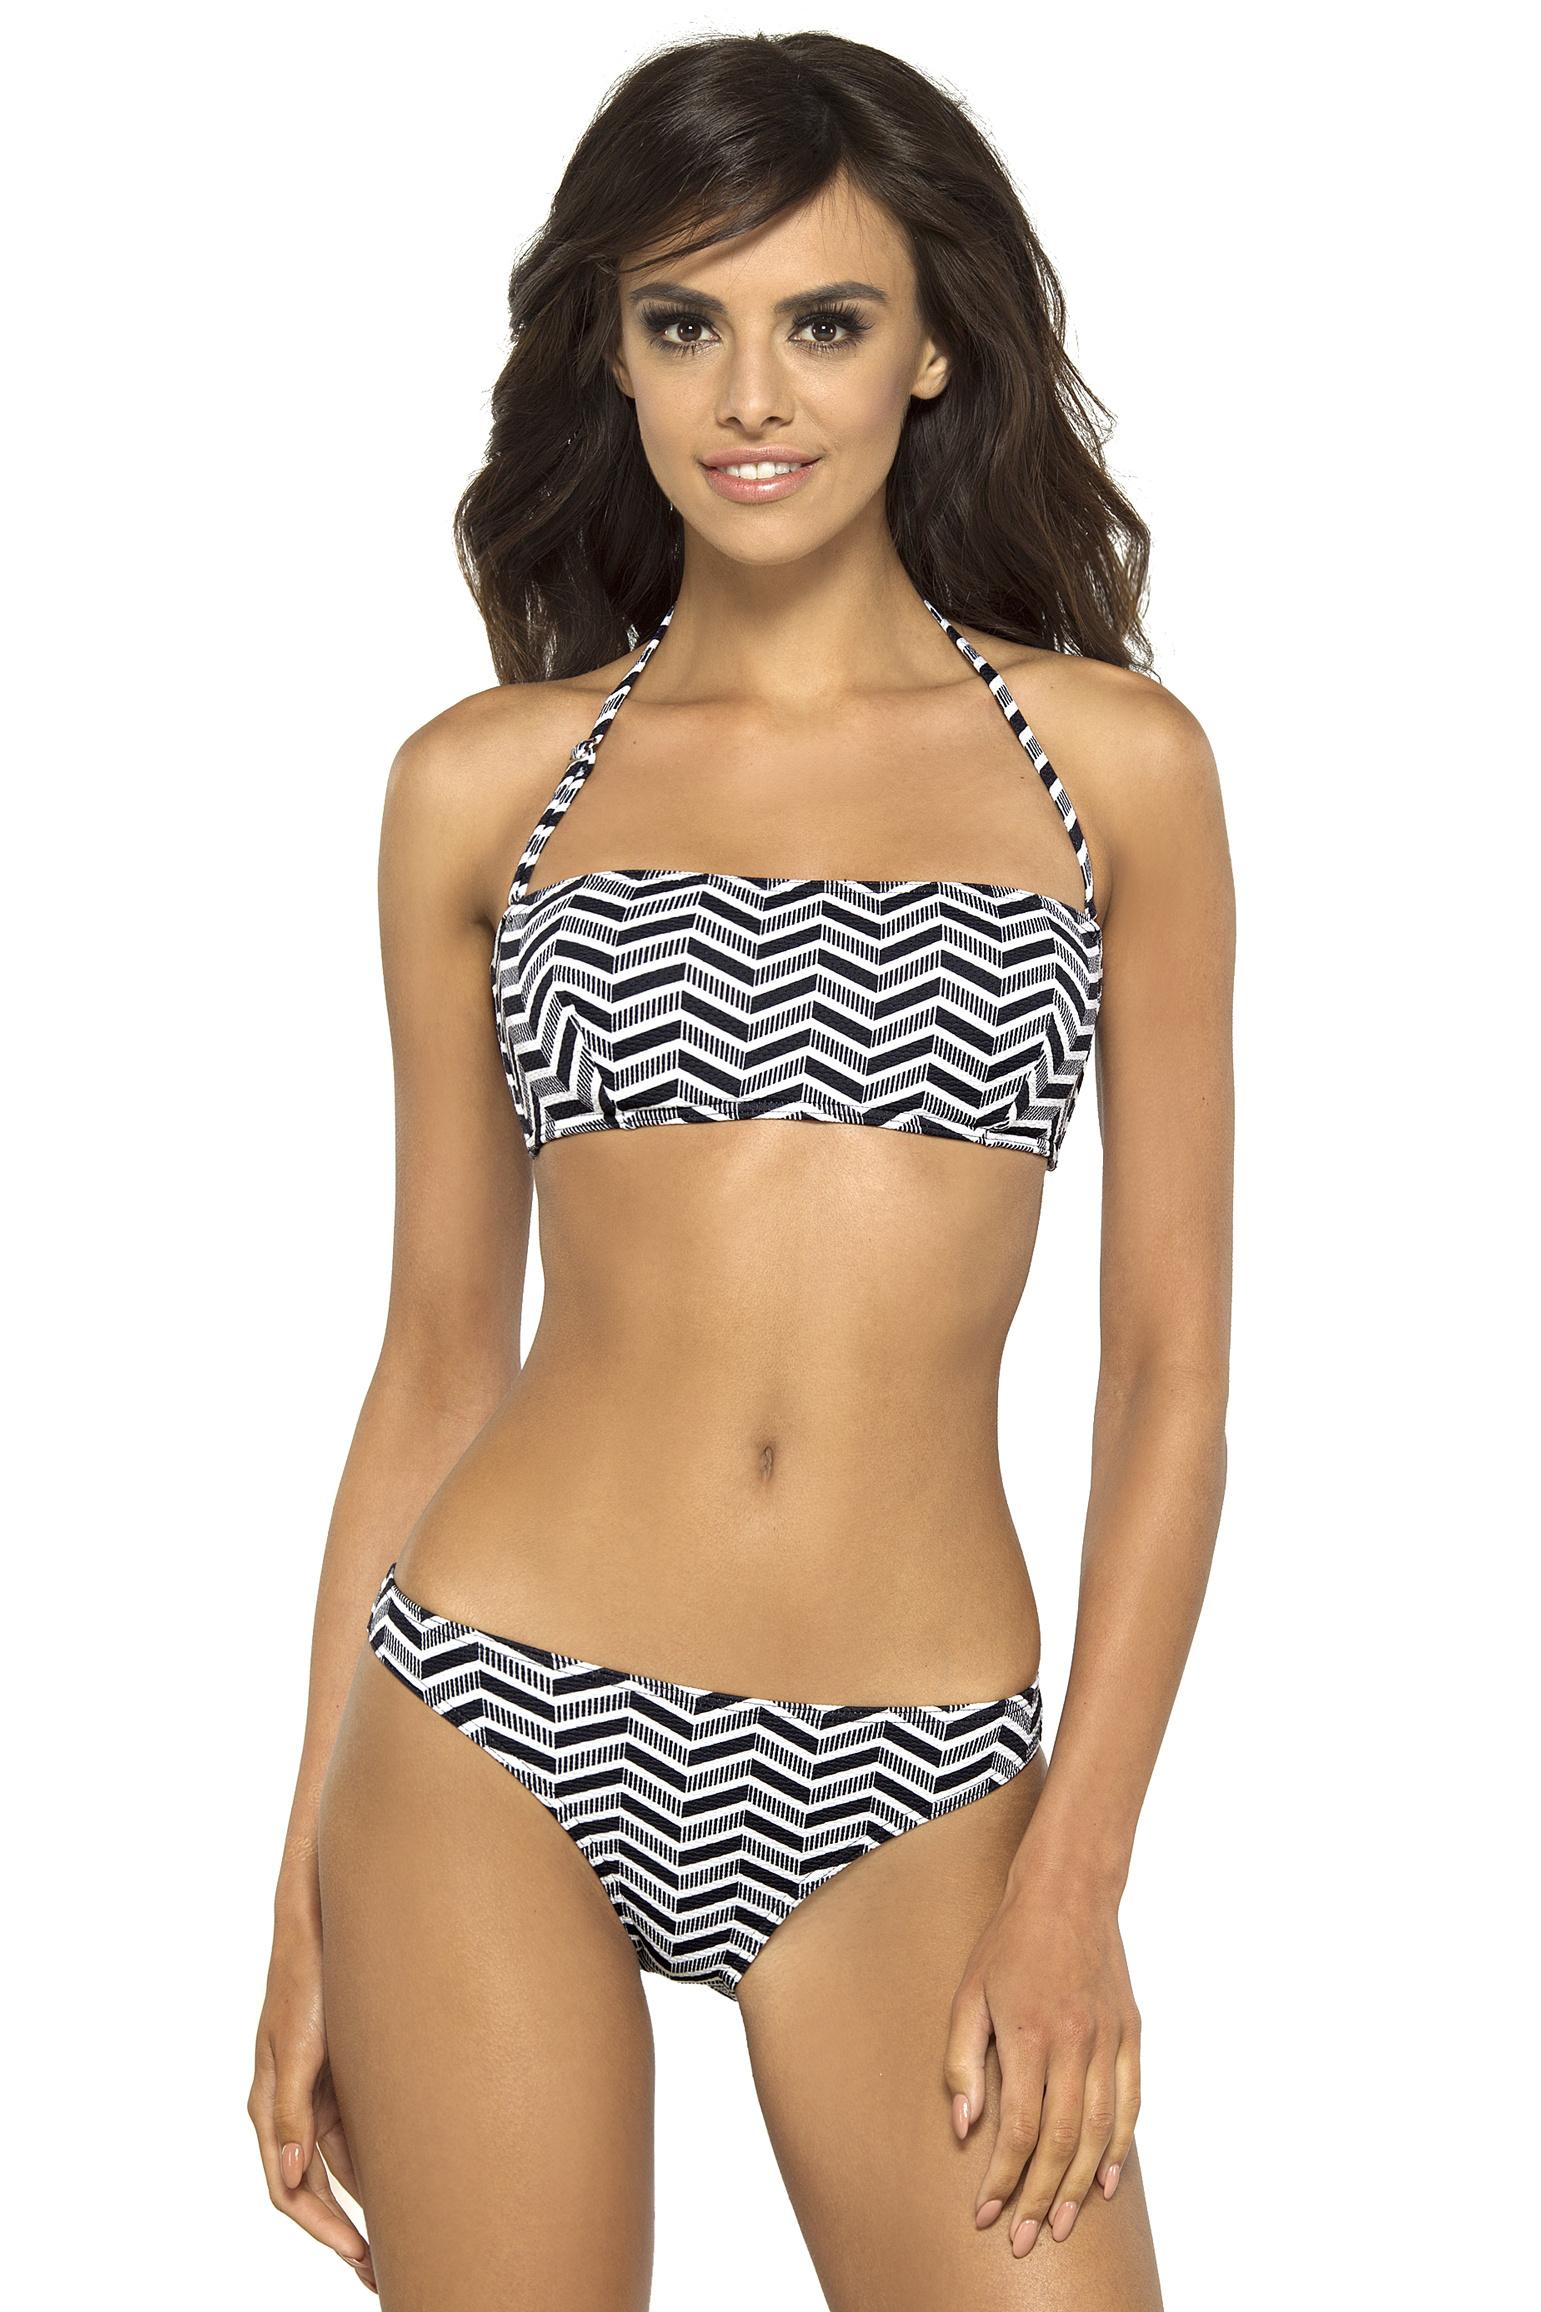 Dámské plavky Alison bandeau s kosticemi